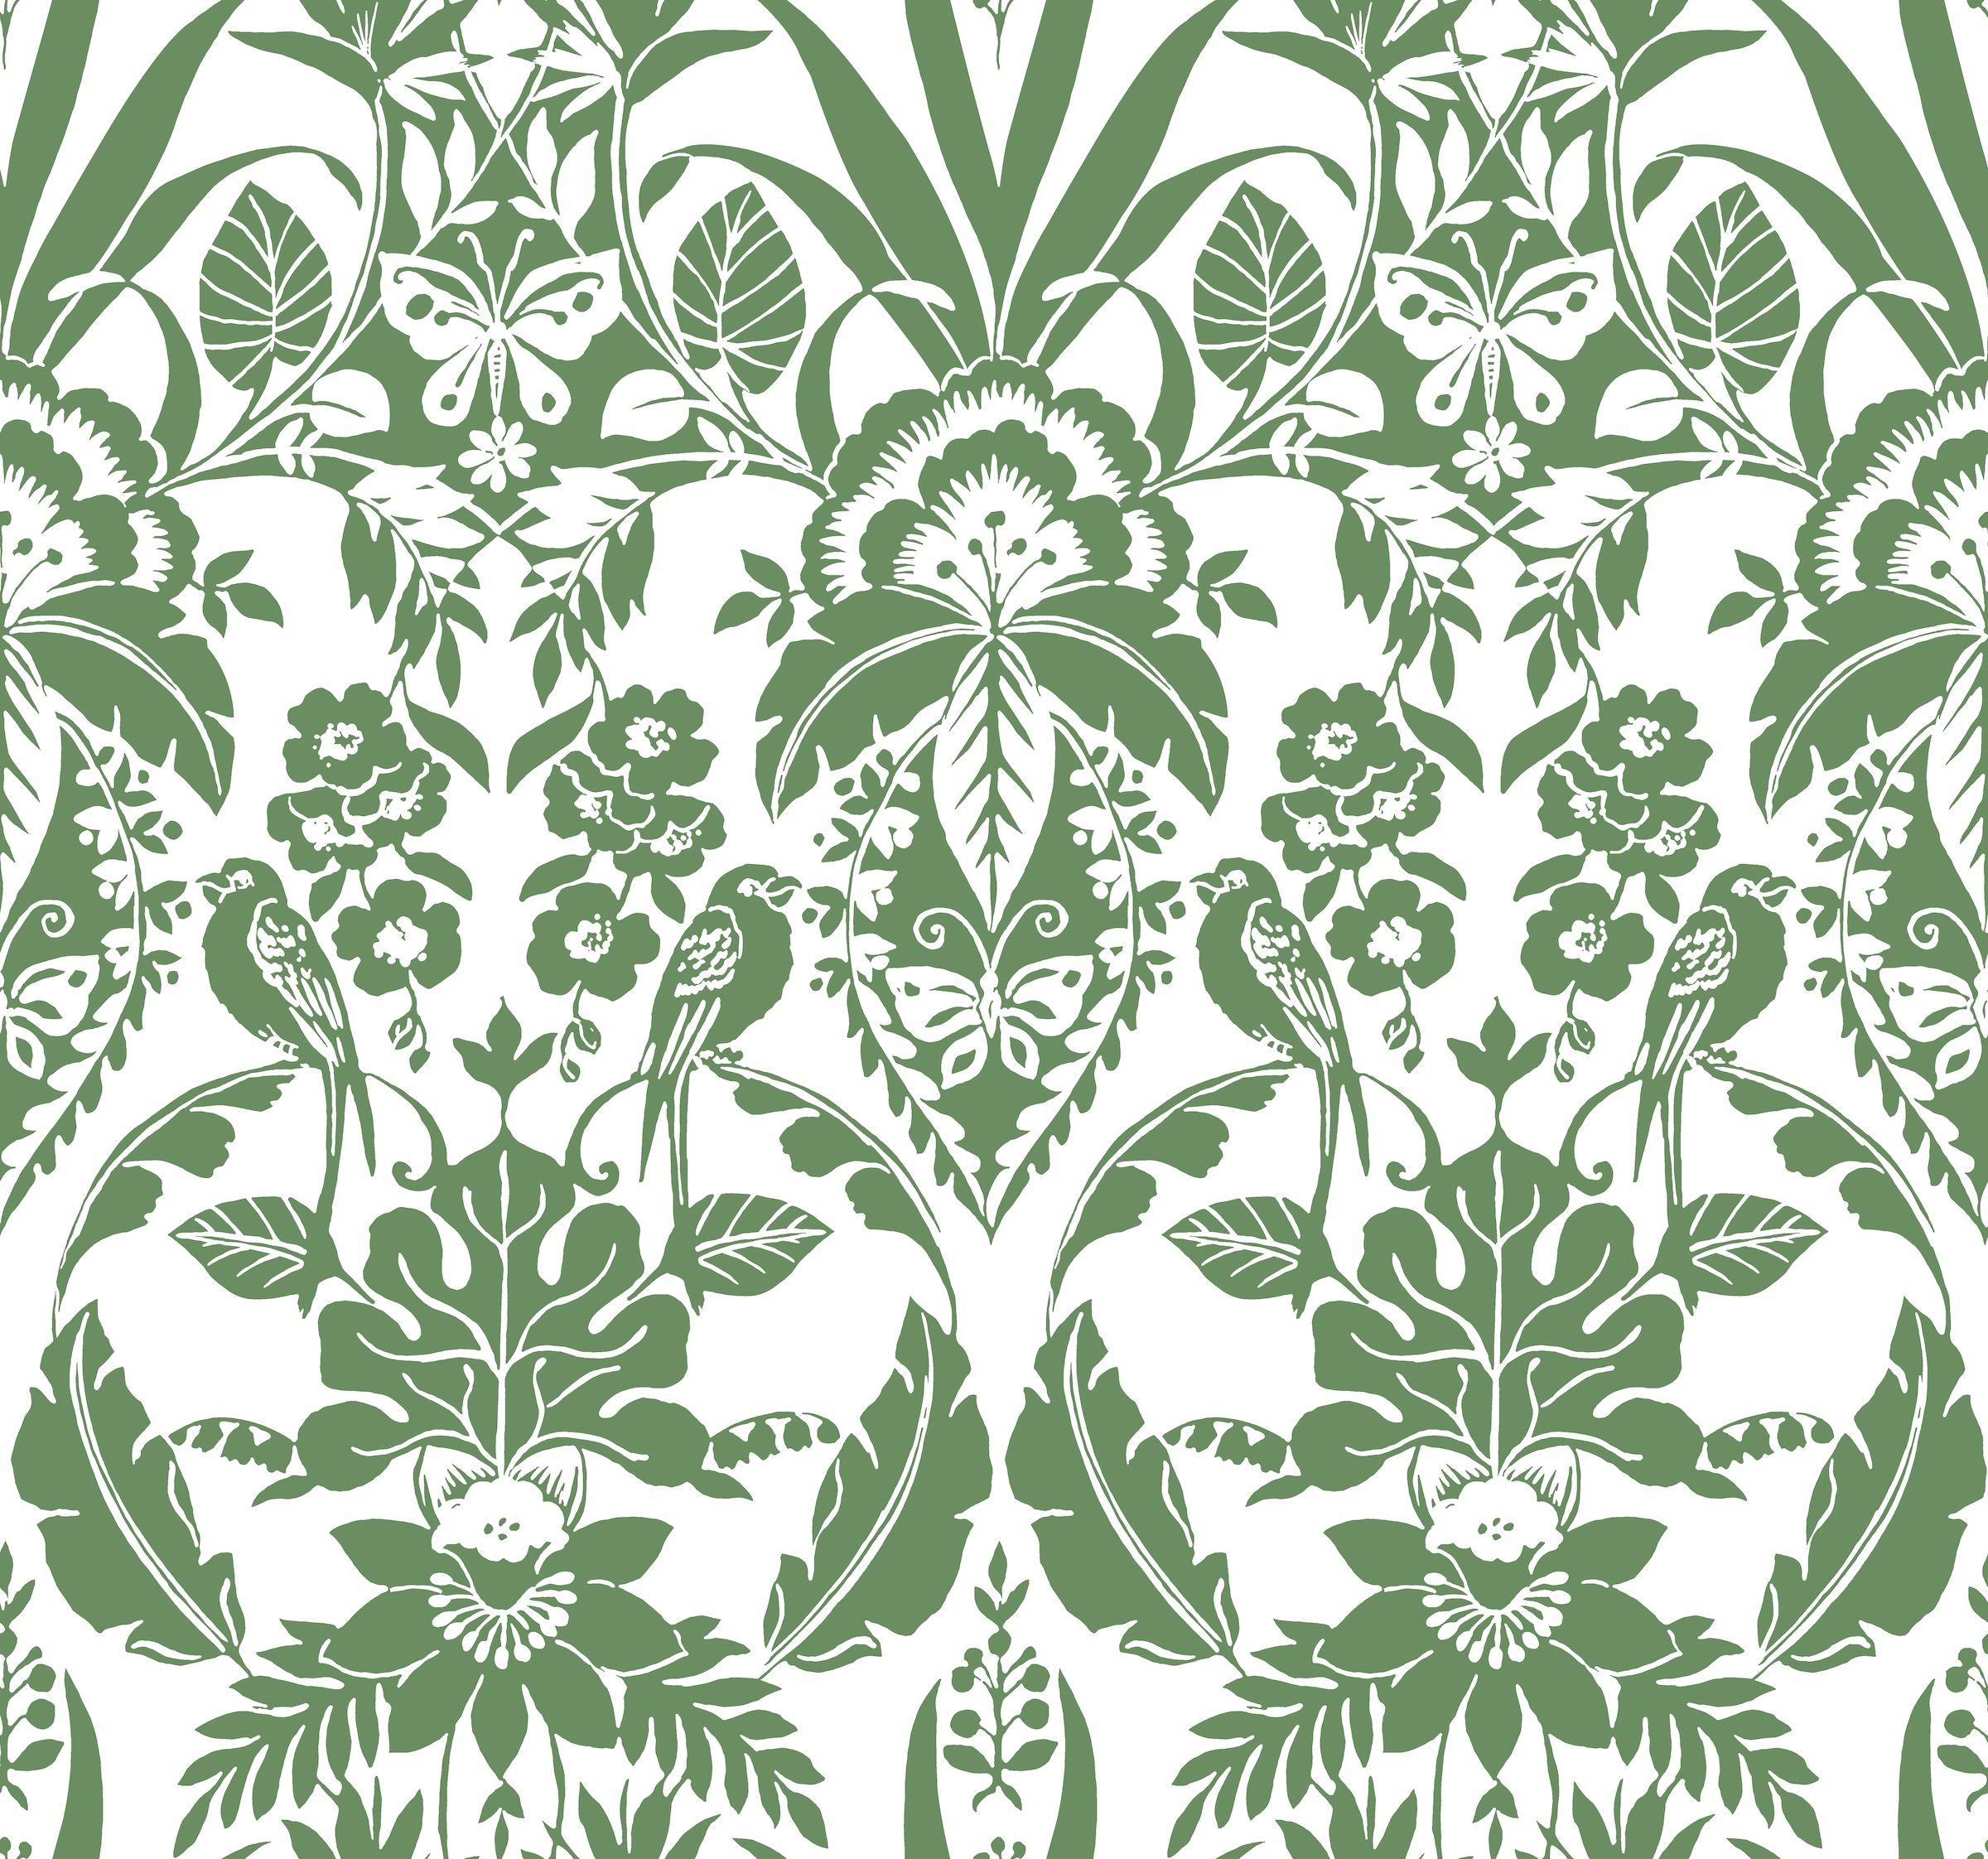 York Wallcoverings Cy1584 Botanical Damask Wallpaper Green The Savvy Decorator